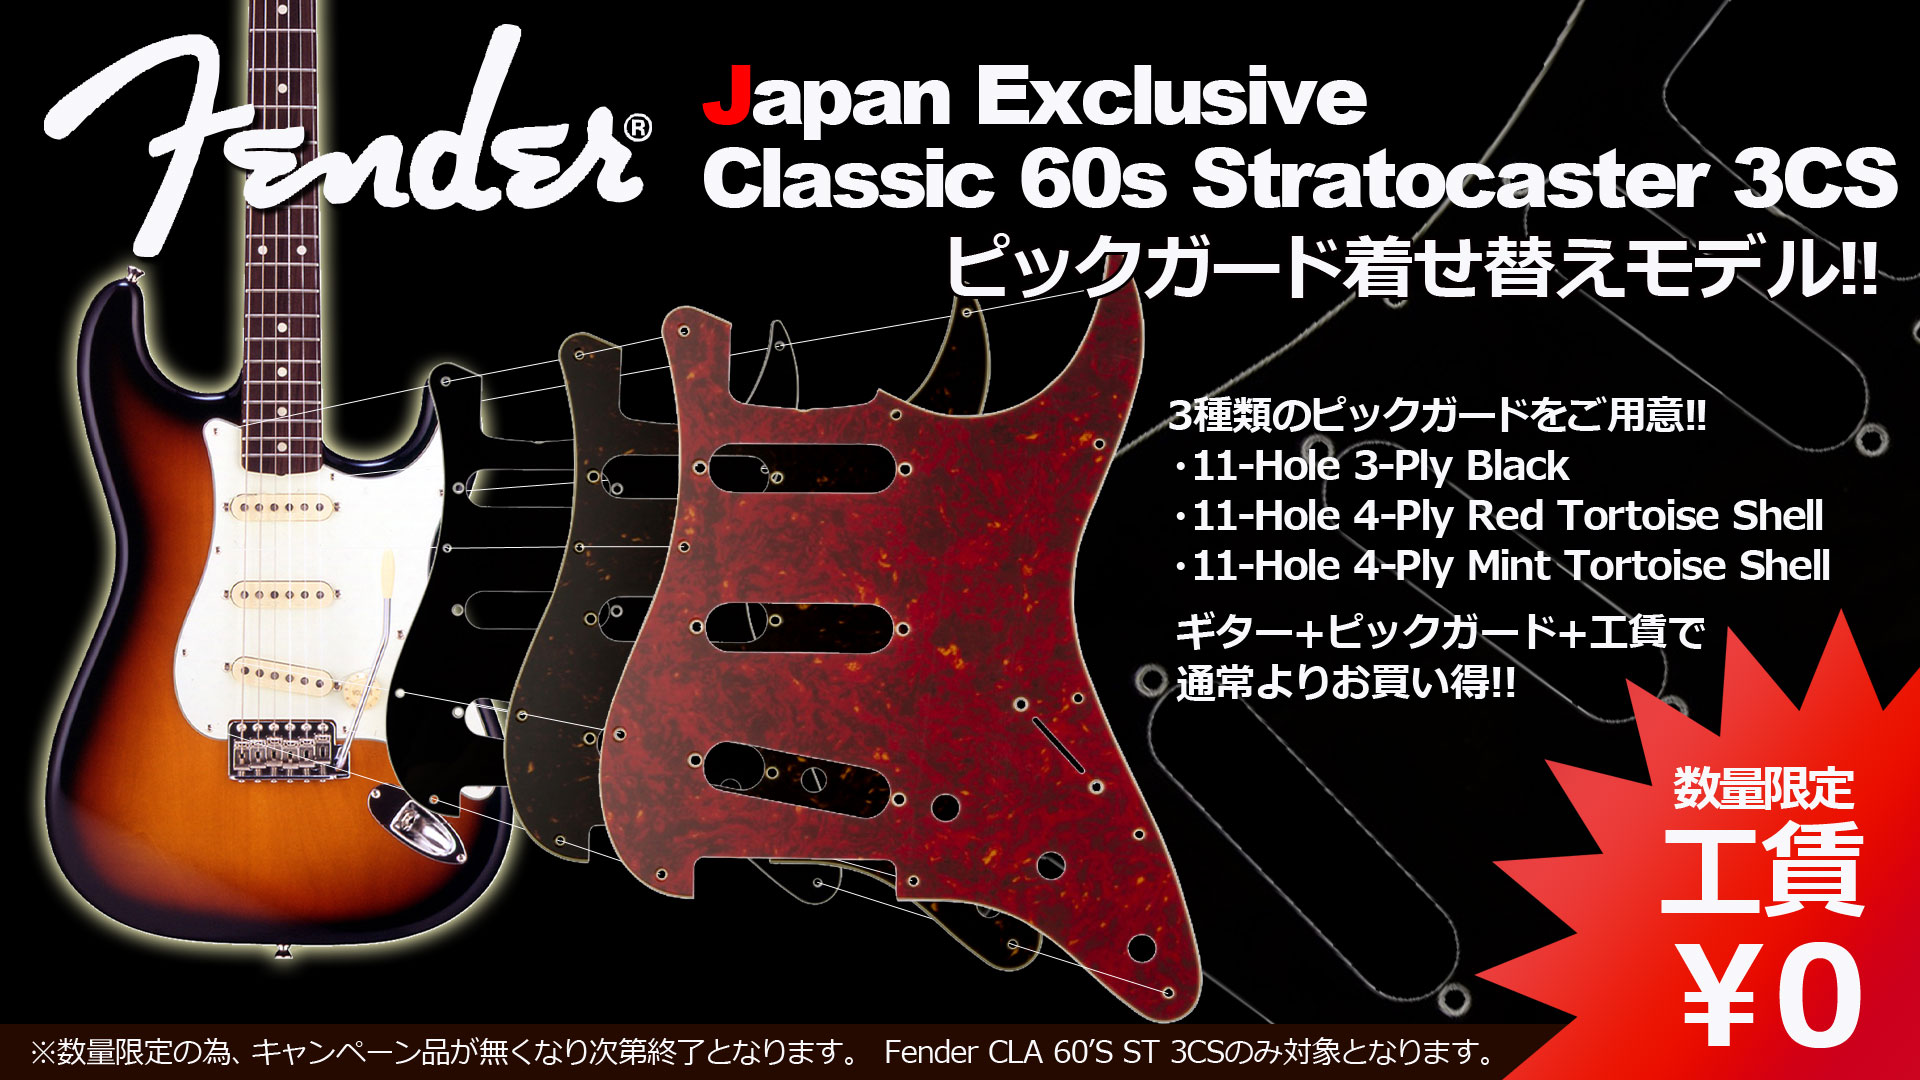 Fender CLA 60s ST 3CS ピックガード着せ替えモデル